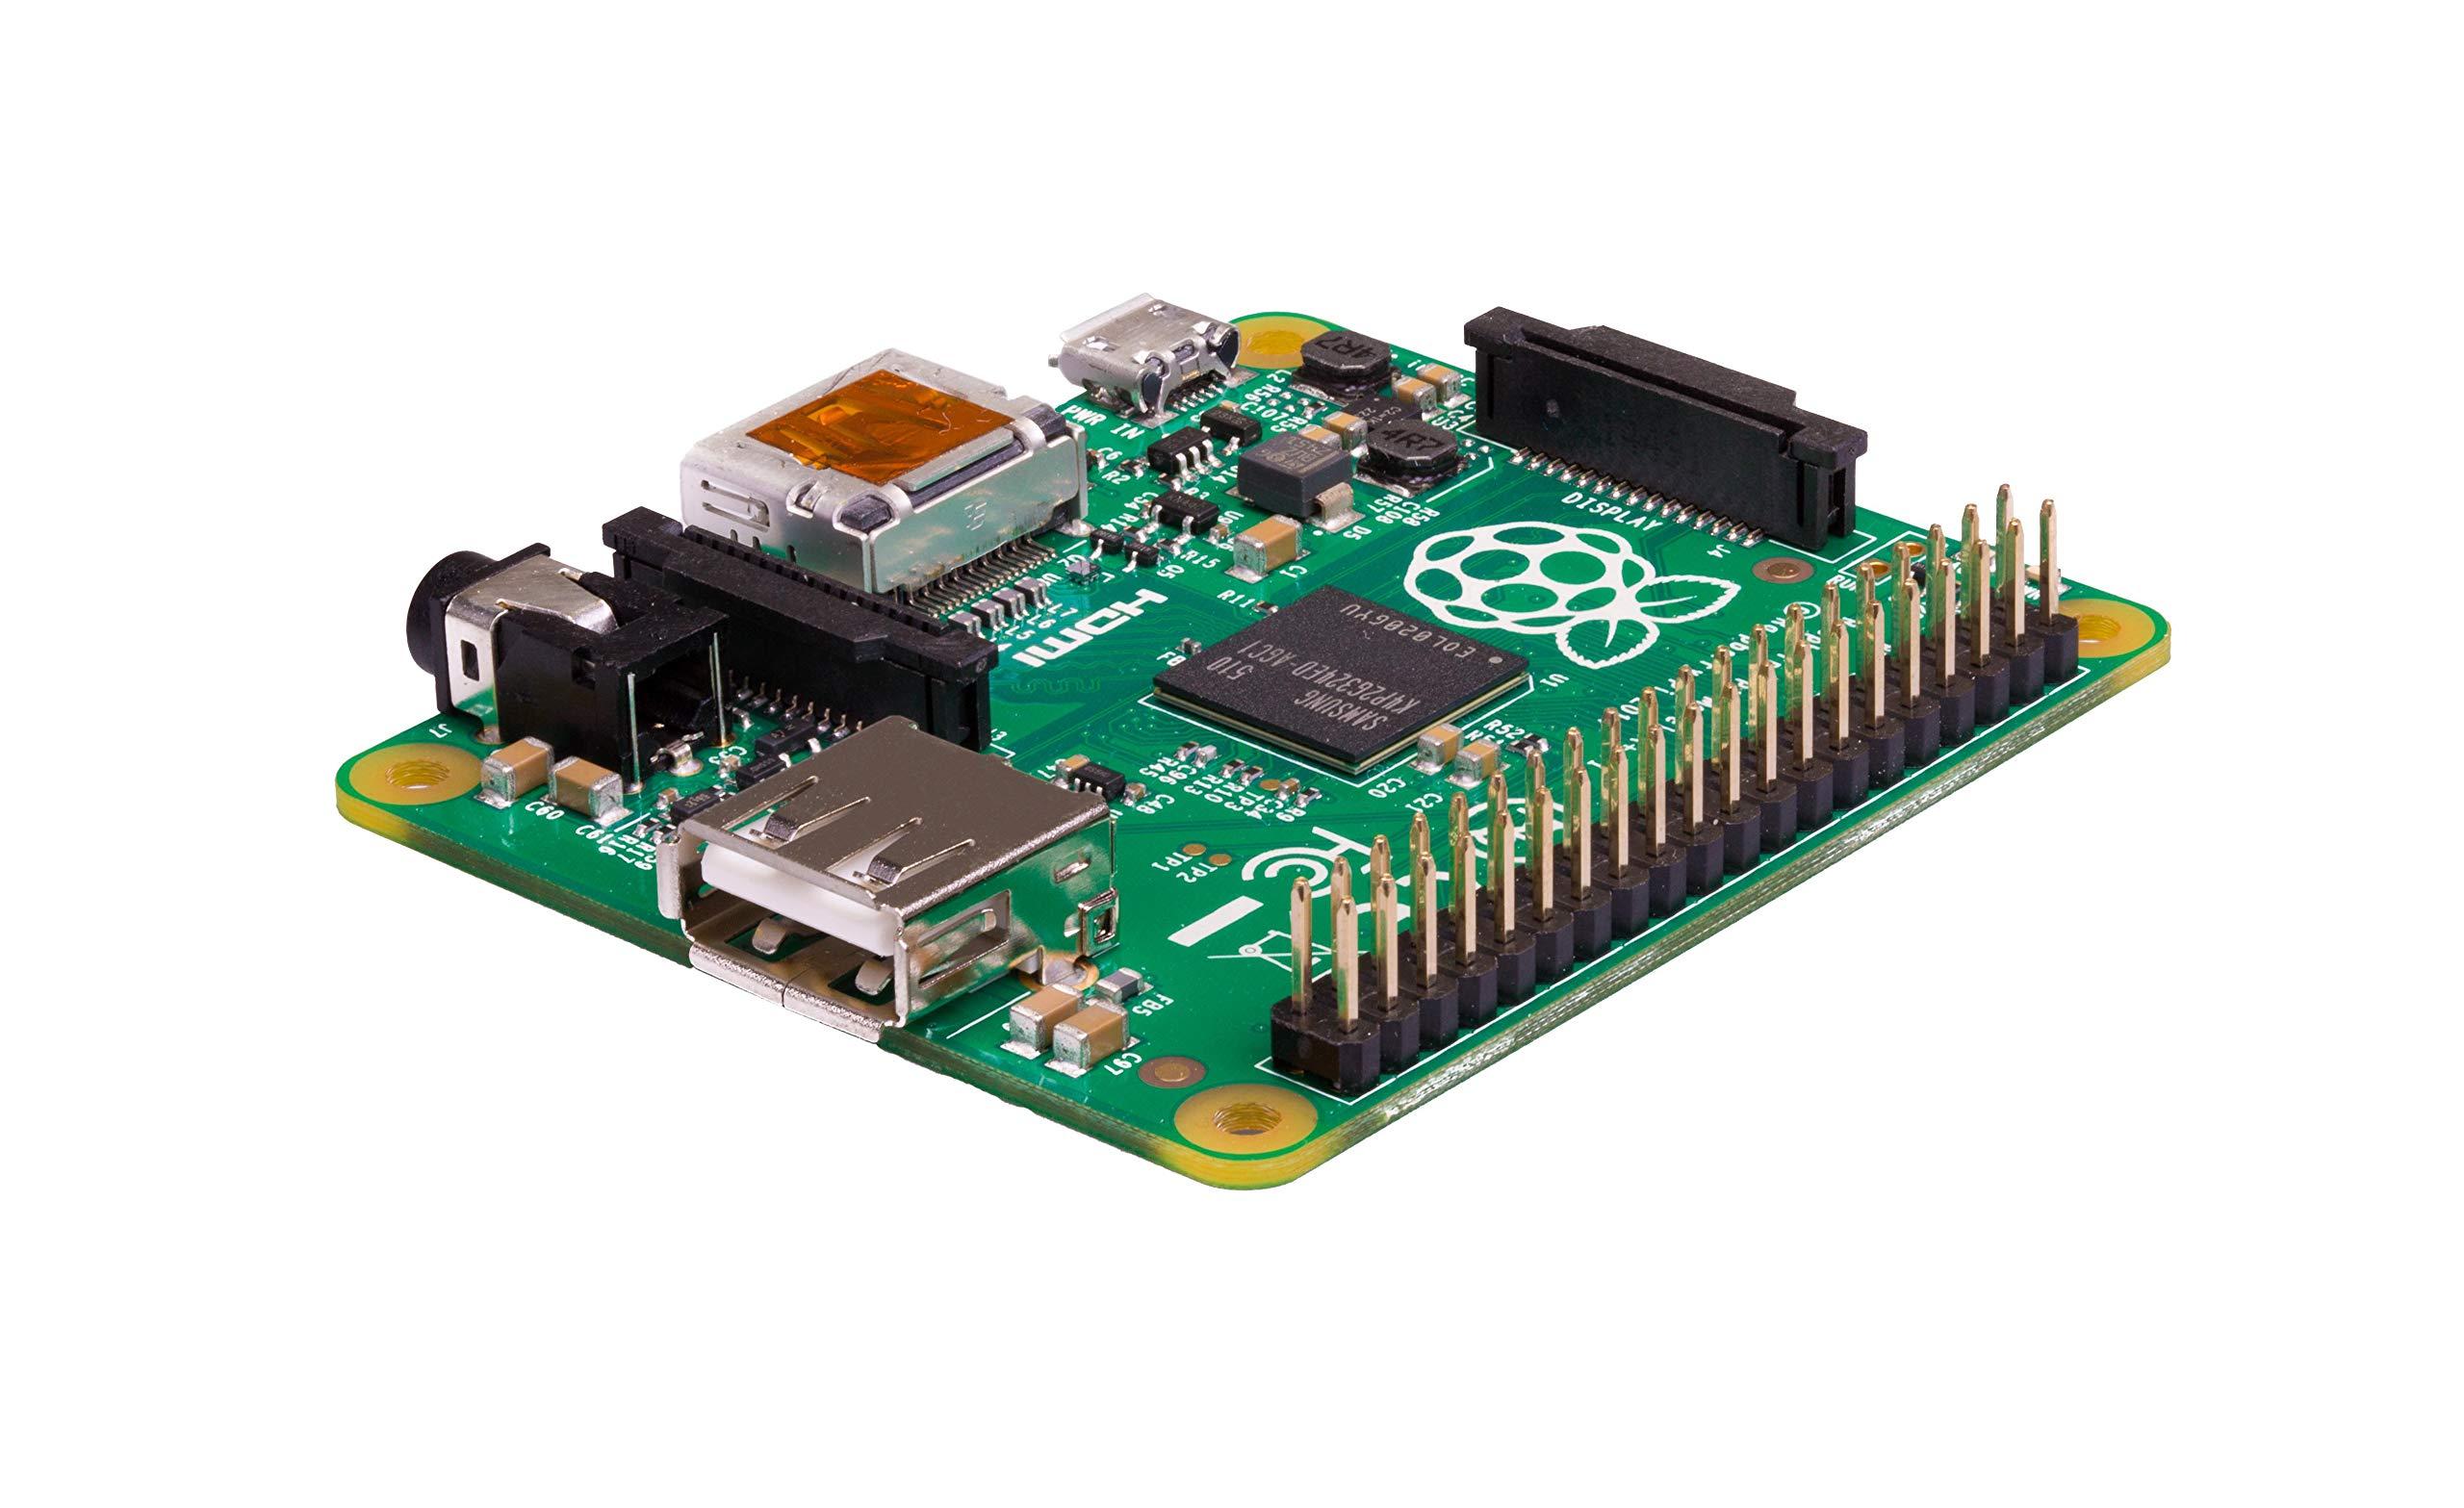 Raspberry Pi 3 A+ Computer Board